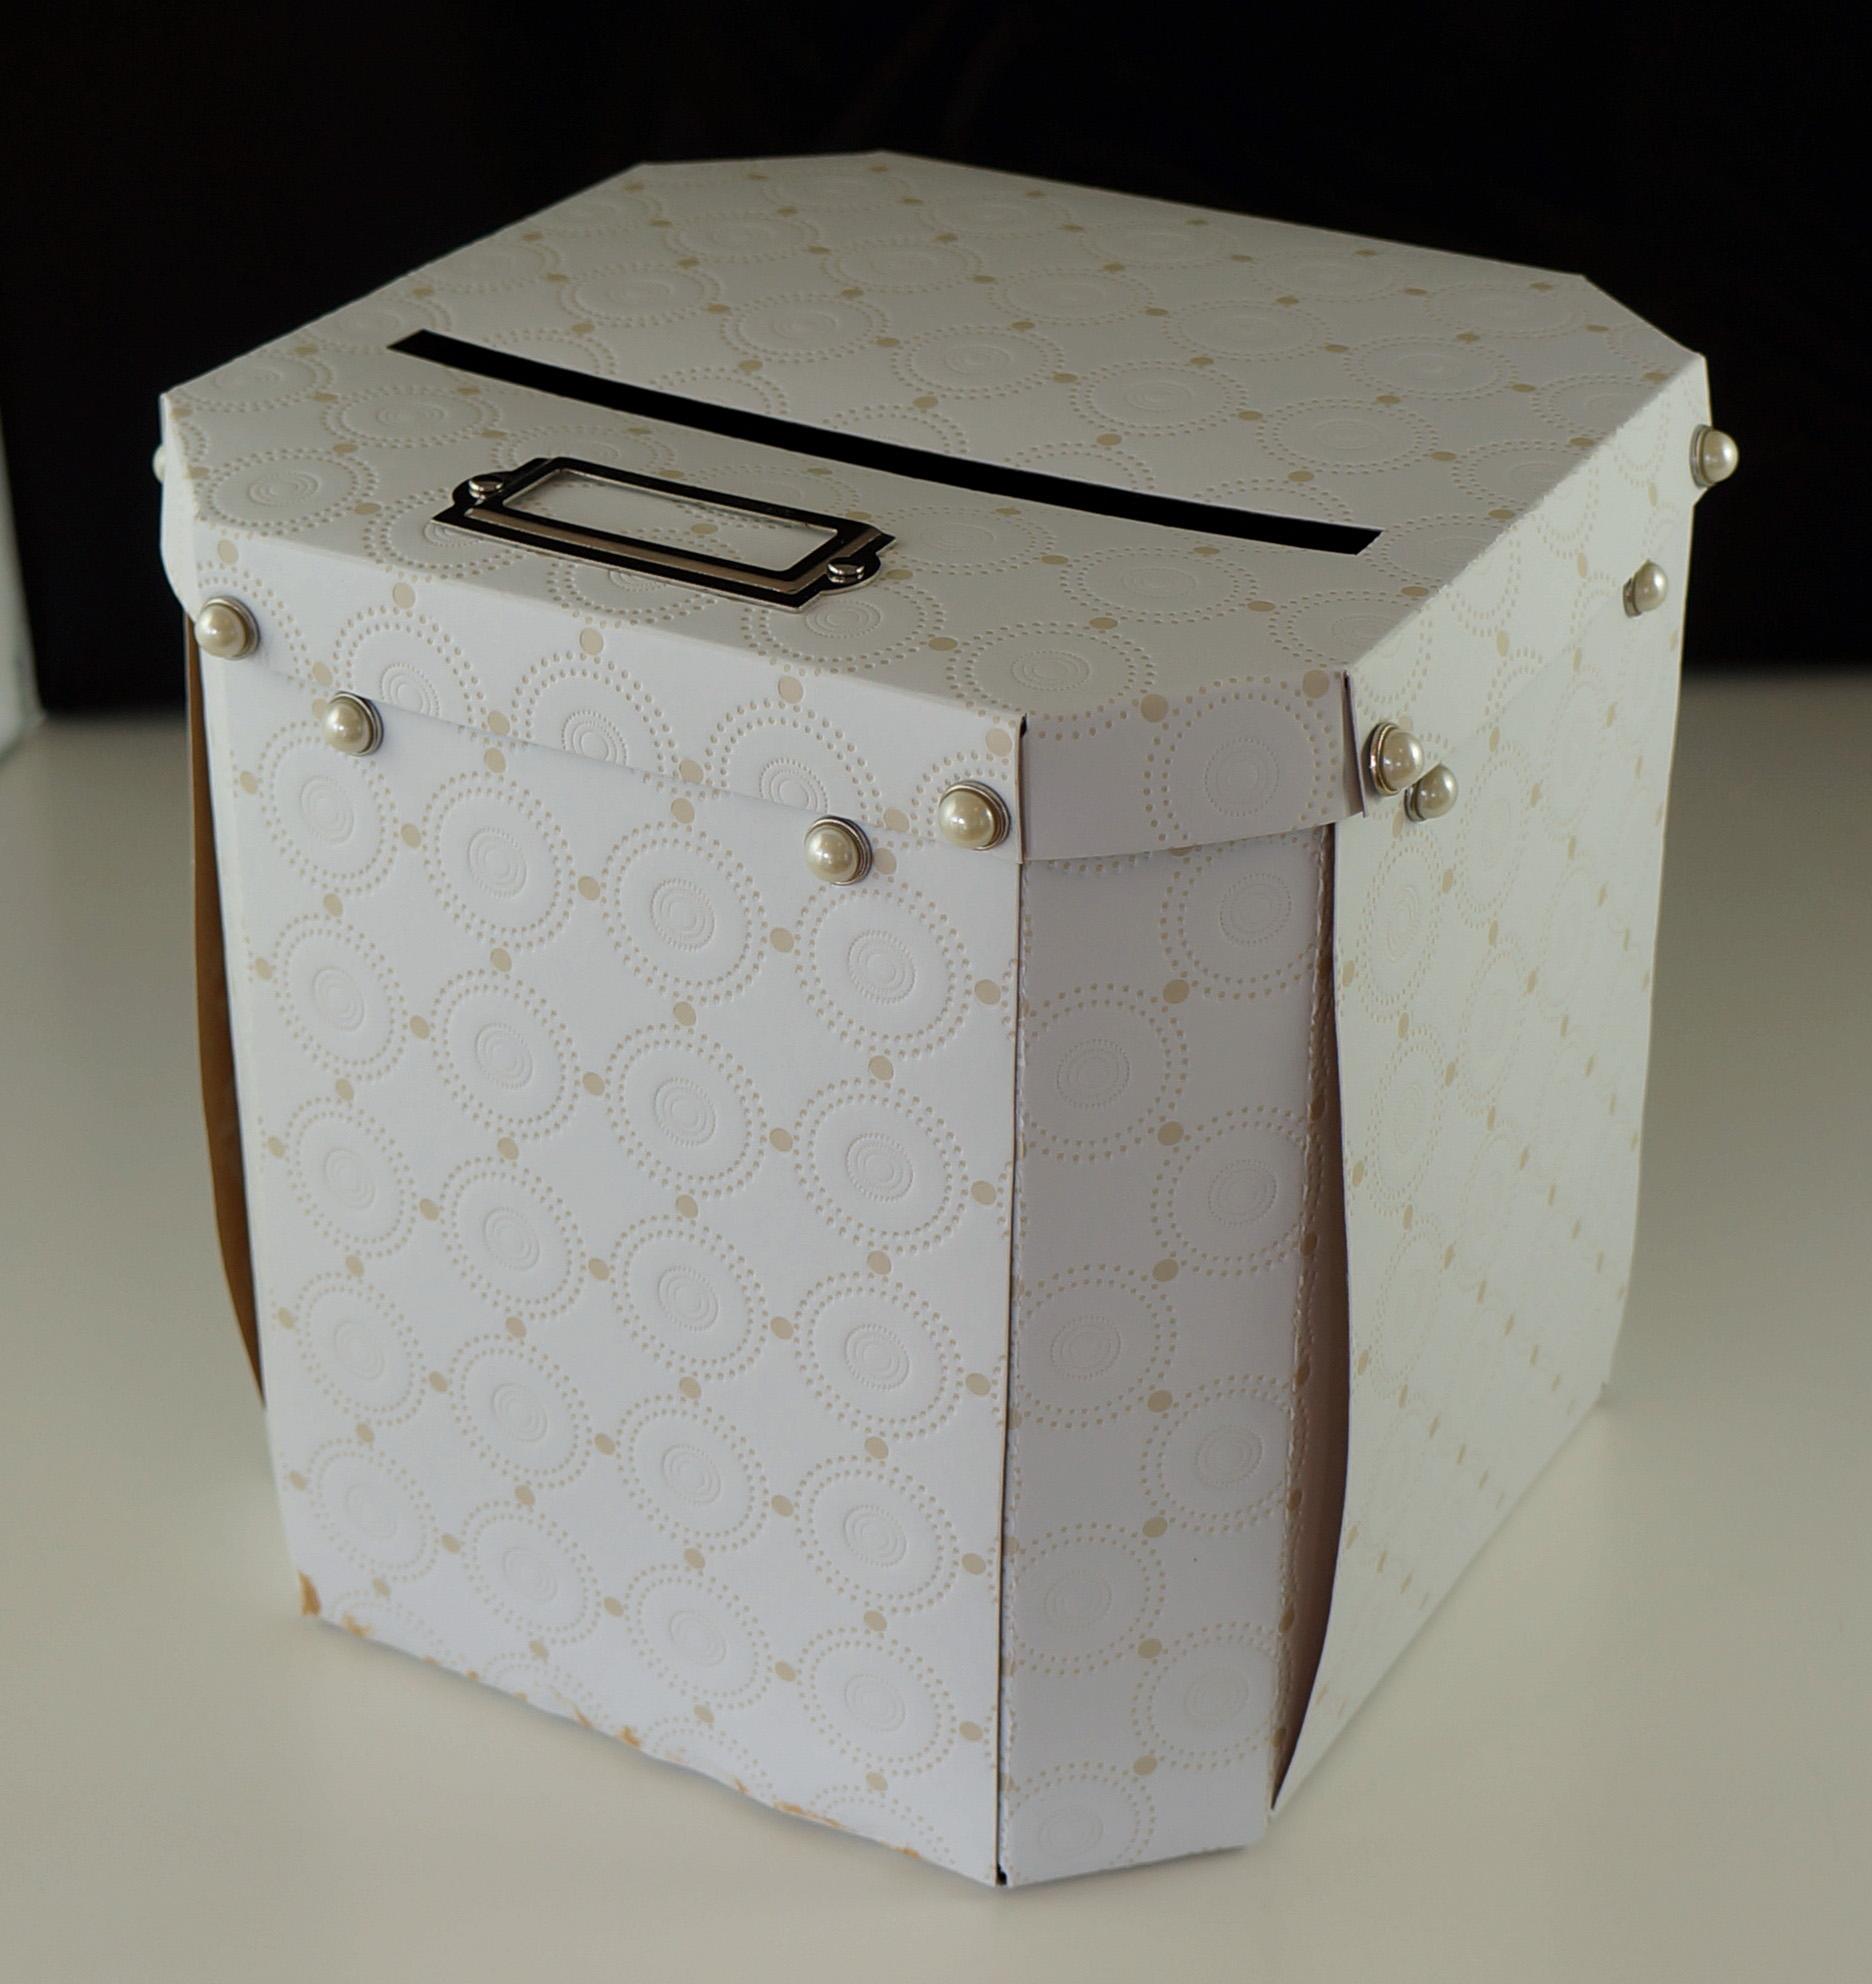 Wilton Ornate Pearl Card Holder Box Doozie Weddings